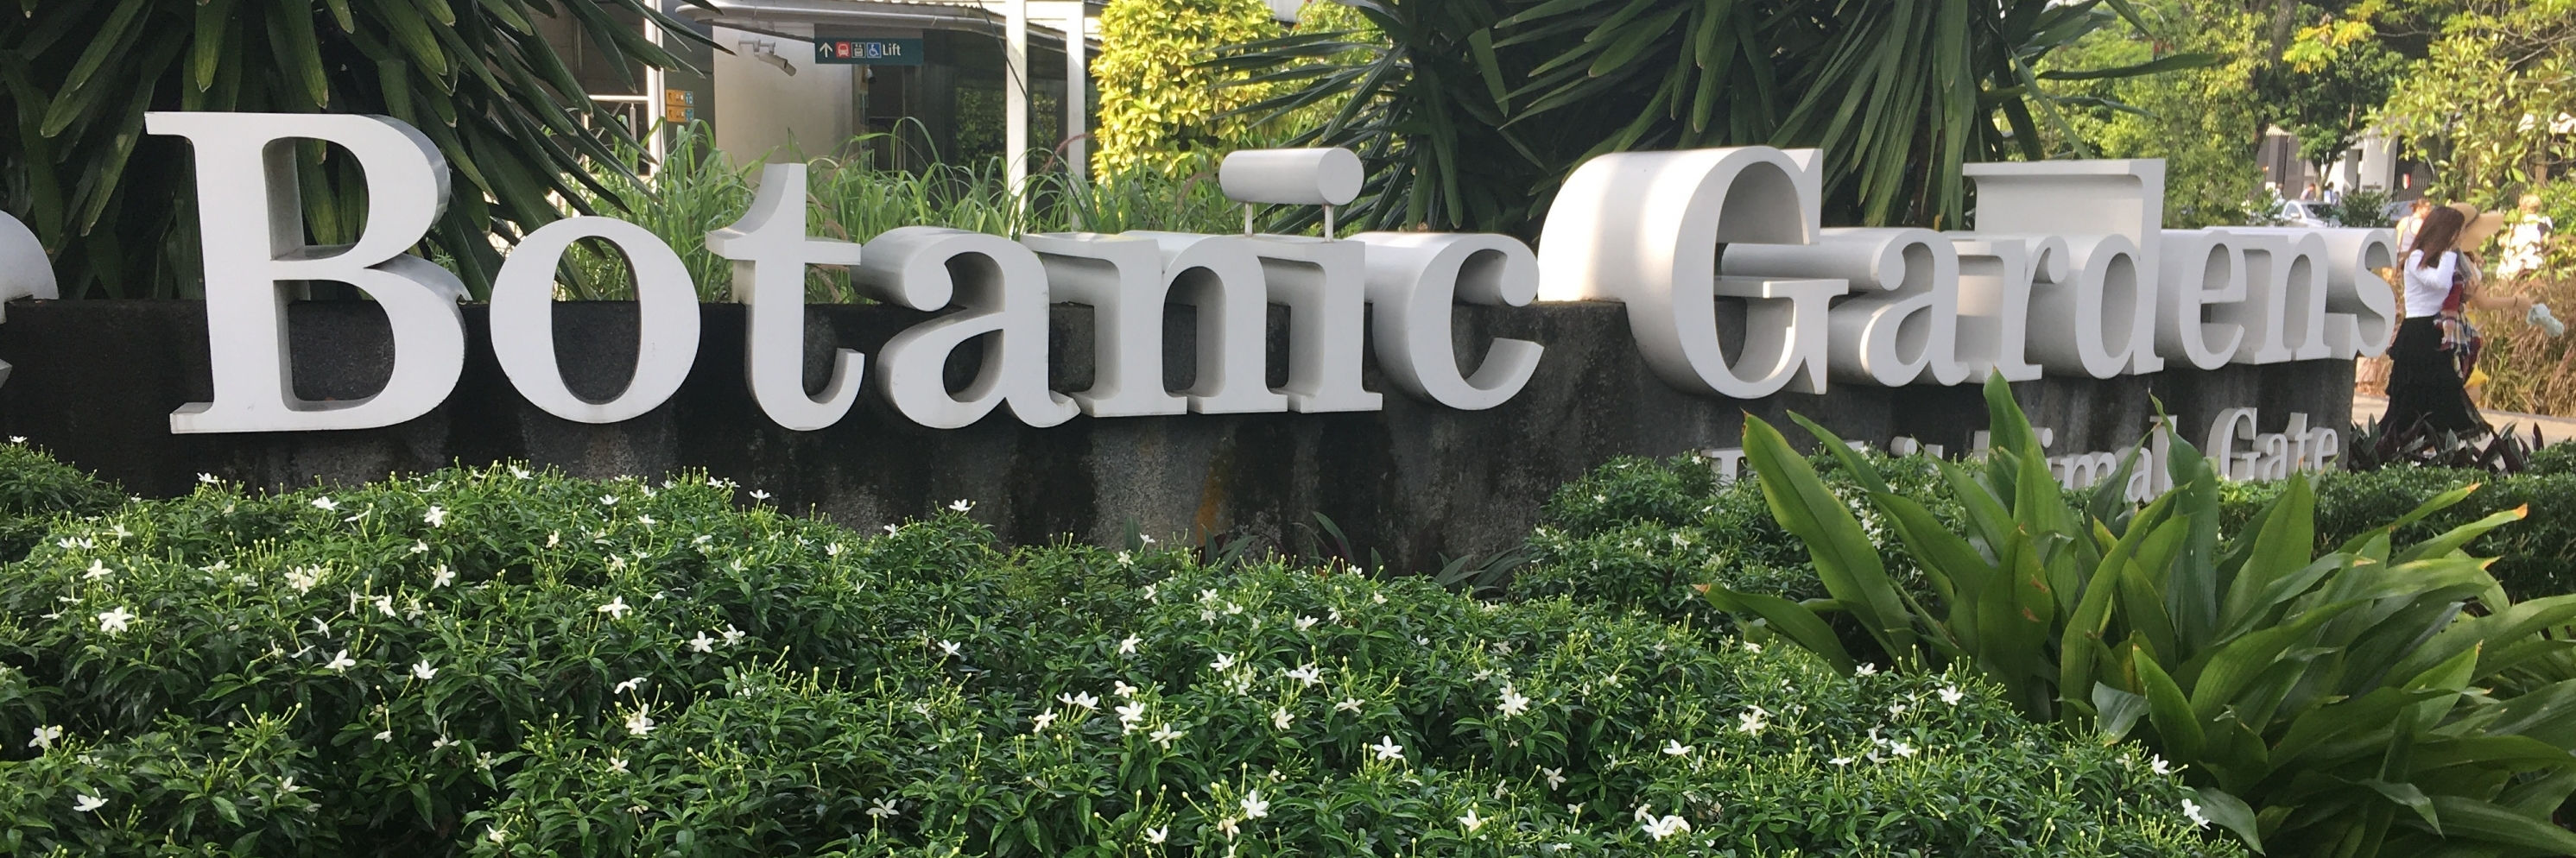 https://gody.vn/blog/flowerhanh4475/post/kinh-nghiem-di-vuon-bach-thao-botanic-gardens-singapore-4697